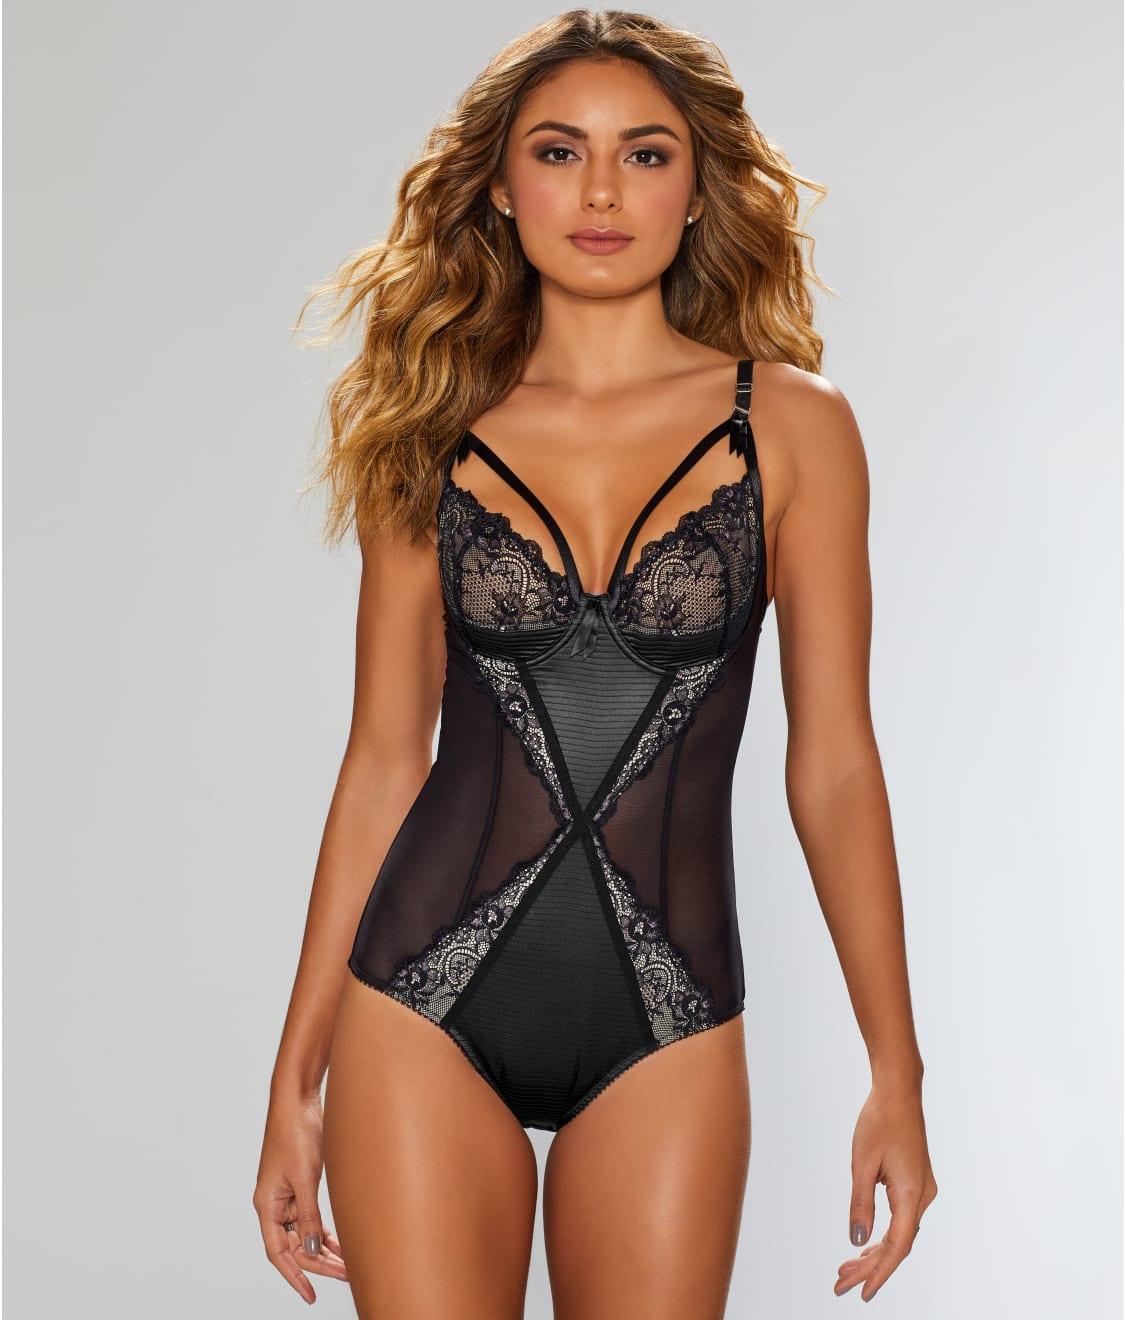 Elegant french lingerie promotion shop for promotional elegant french - Dita Von Teese Madame X Bodysuit